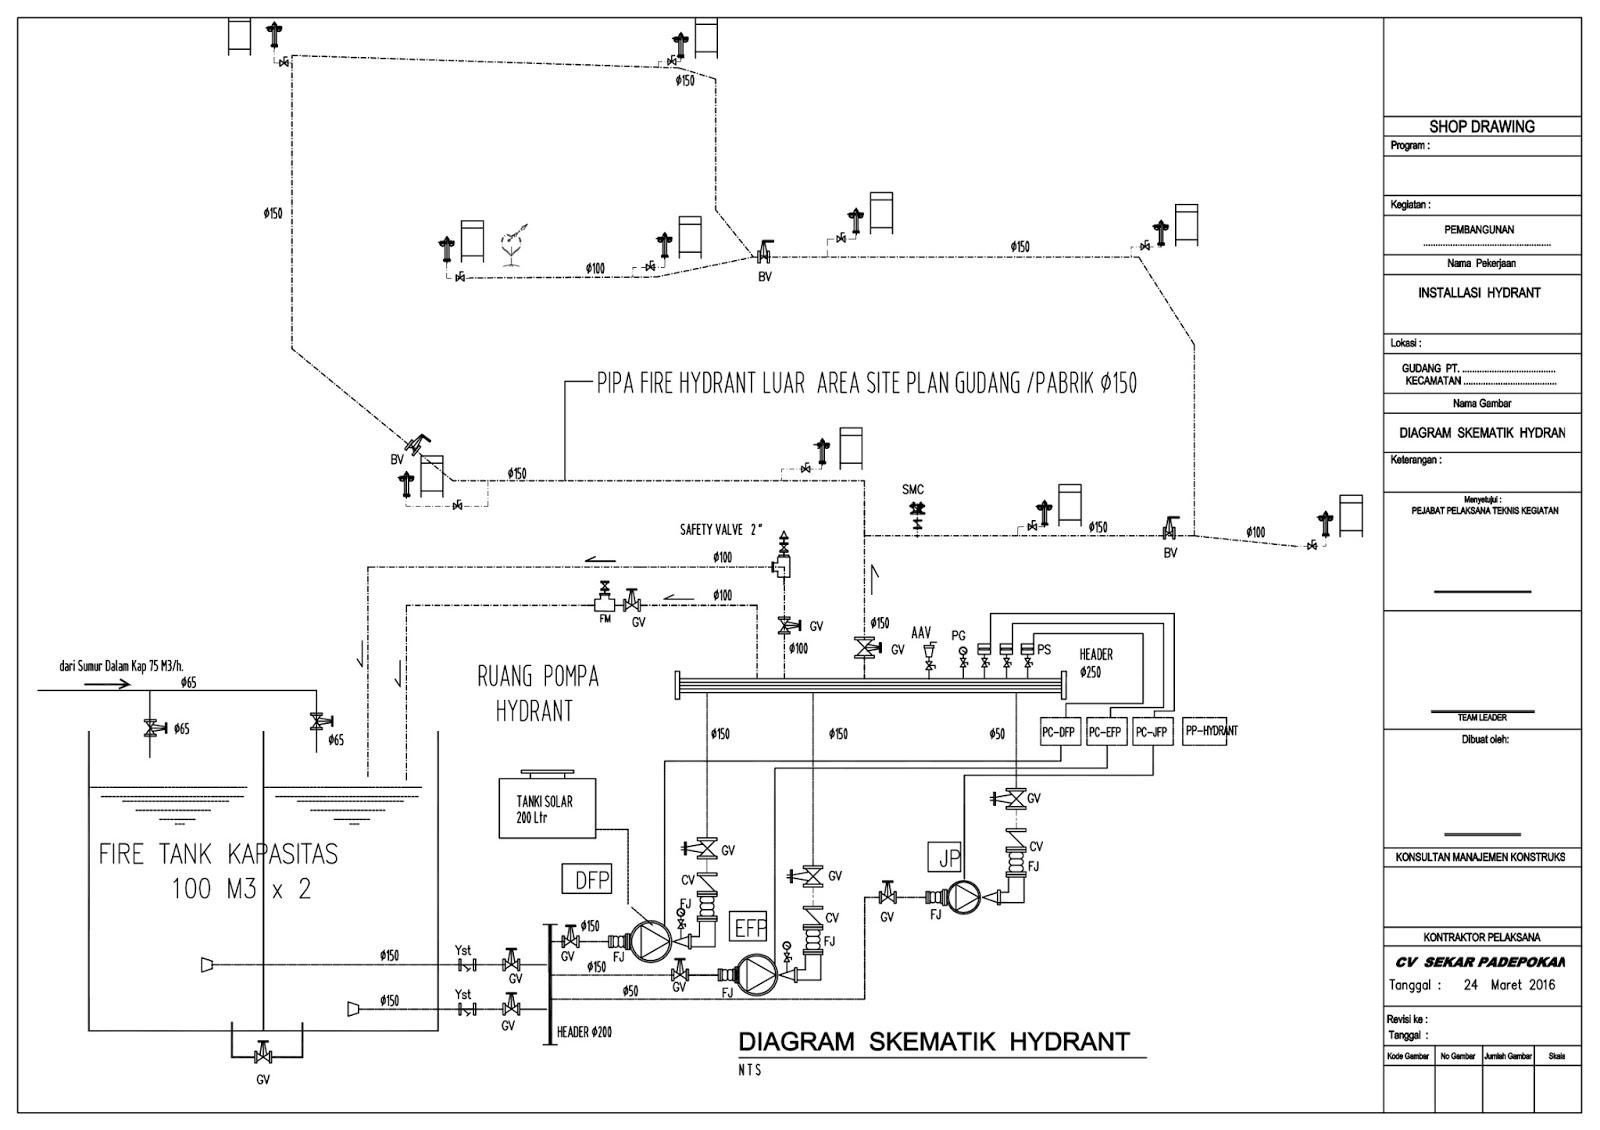 basic fire hydrant diagram simple car radio wiring pekerjaan cv sekar padepokan kontruksi